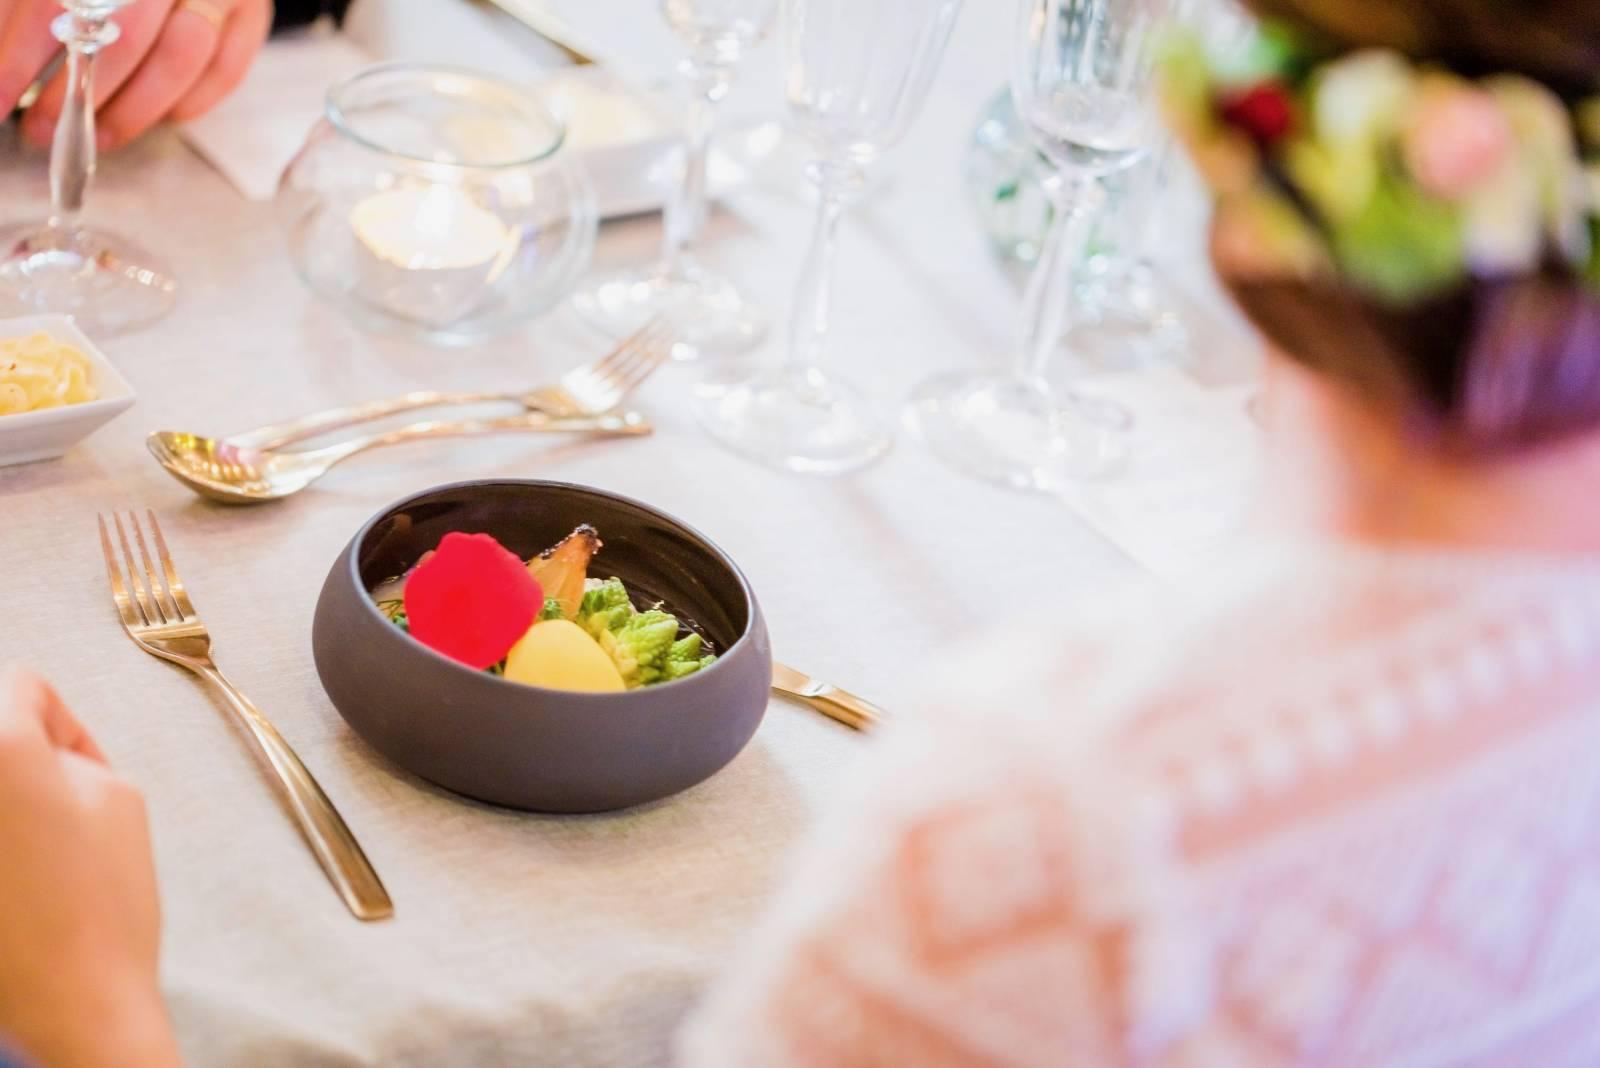 Collage - Biorganic - Catering - Cateraar - Traiteur - Biologisch - House of Weddings - 22